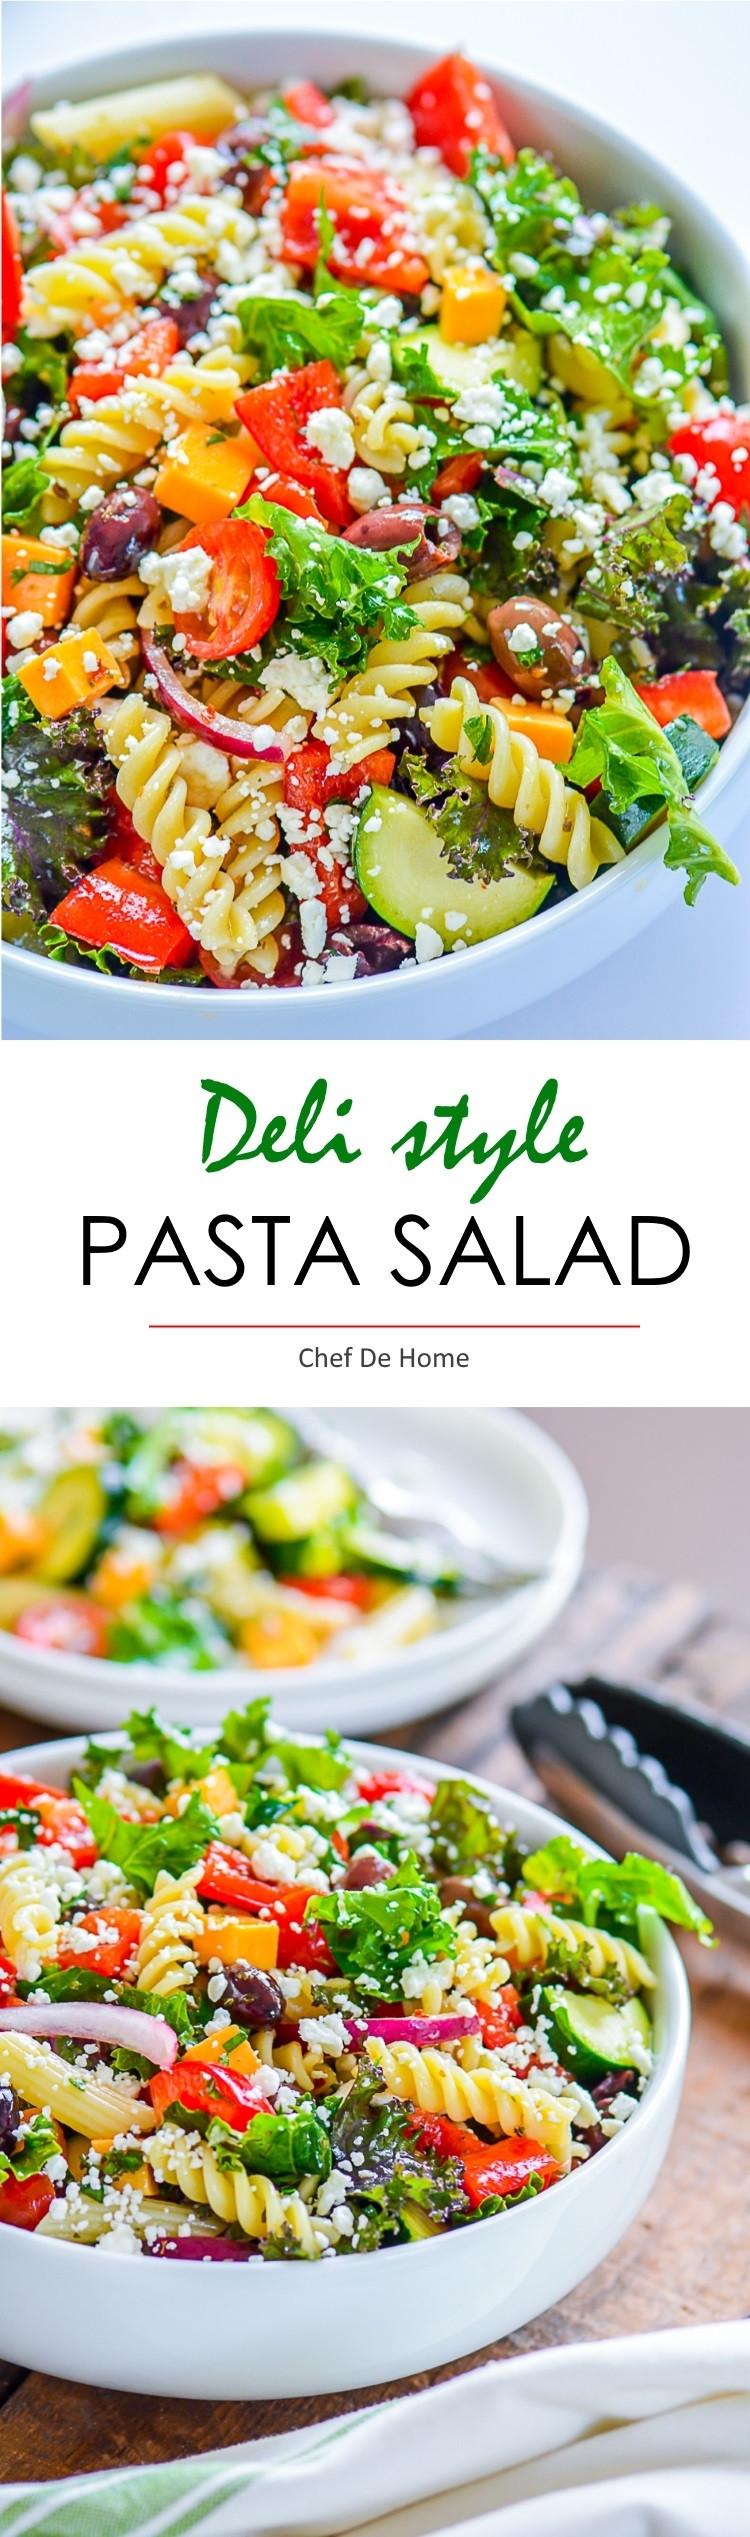 Cold Vegetarian Potluck Recipes  Deli Style Pasta Salad with Kale Recipe